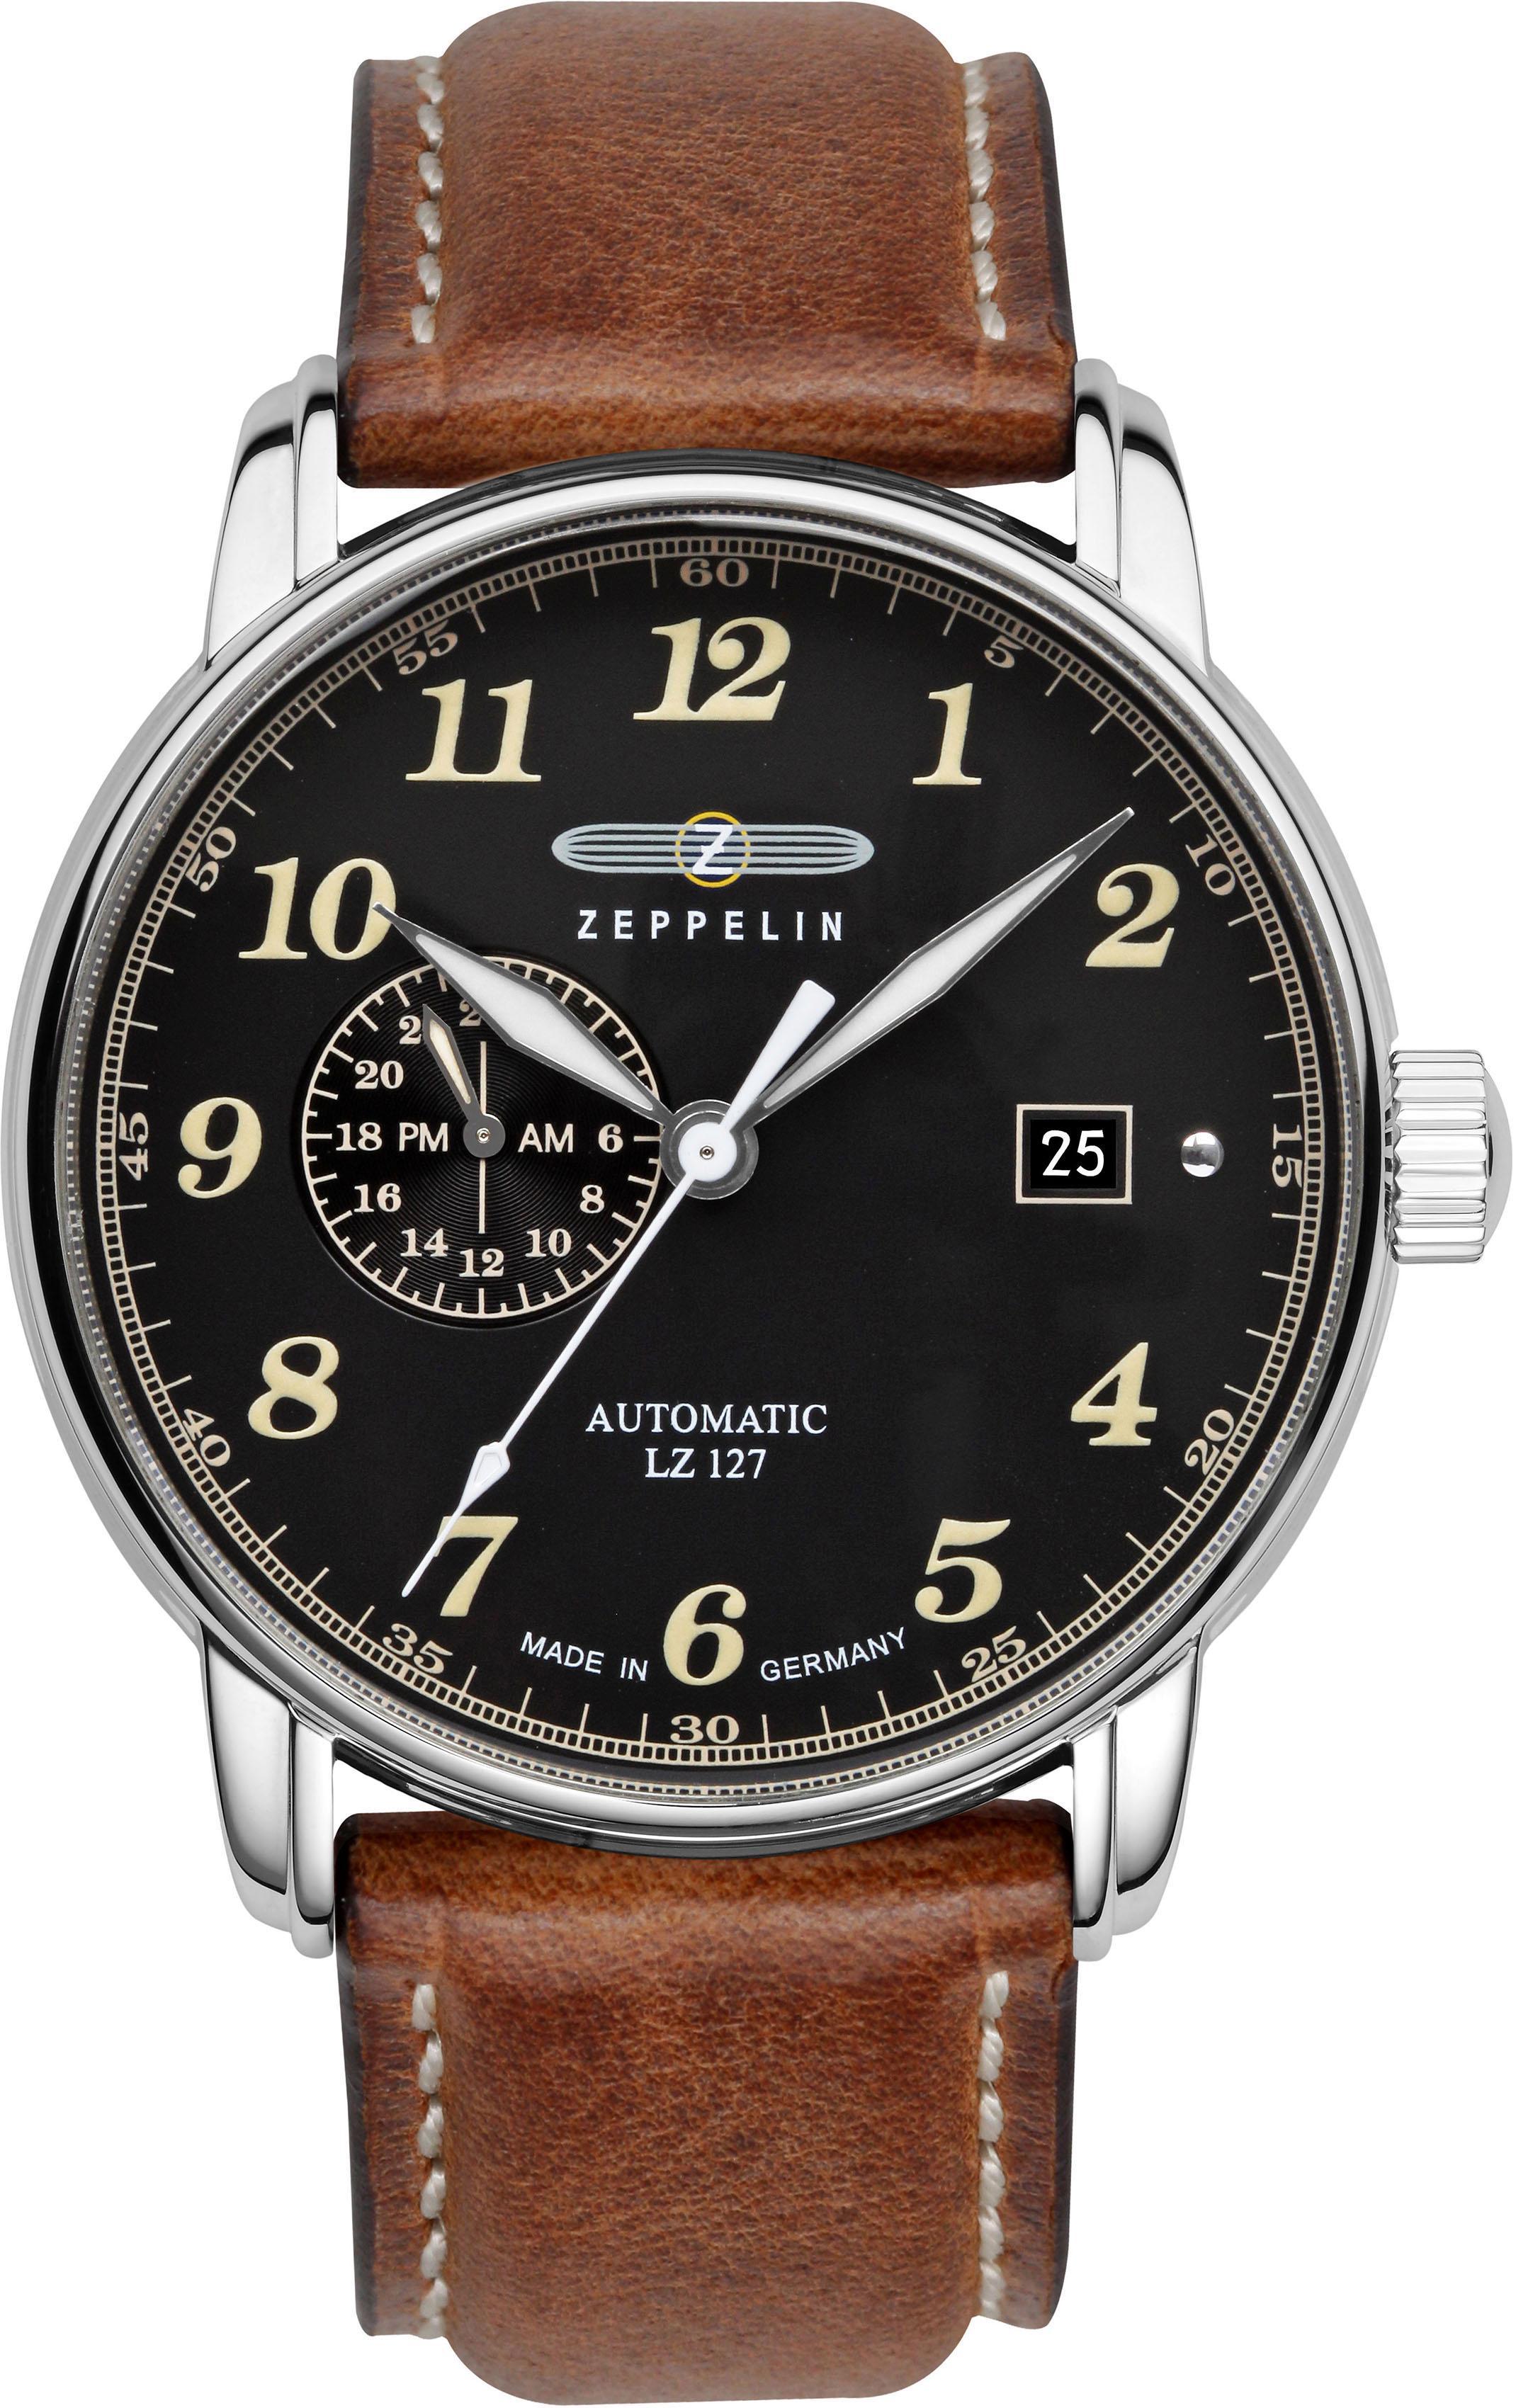 ZEPPELIN Automatikuhr Graf Zeppelin 8668-2   Uhren > Automatikuhren   Braun   Zeppelin